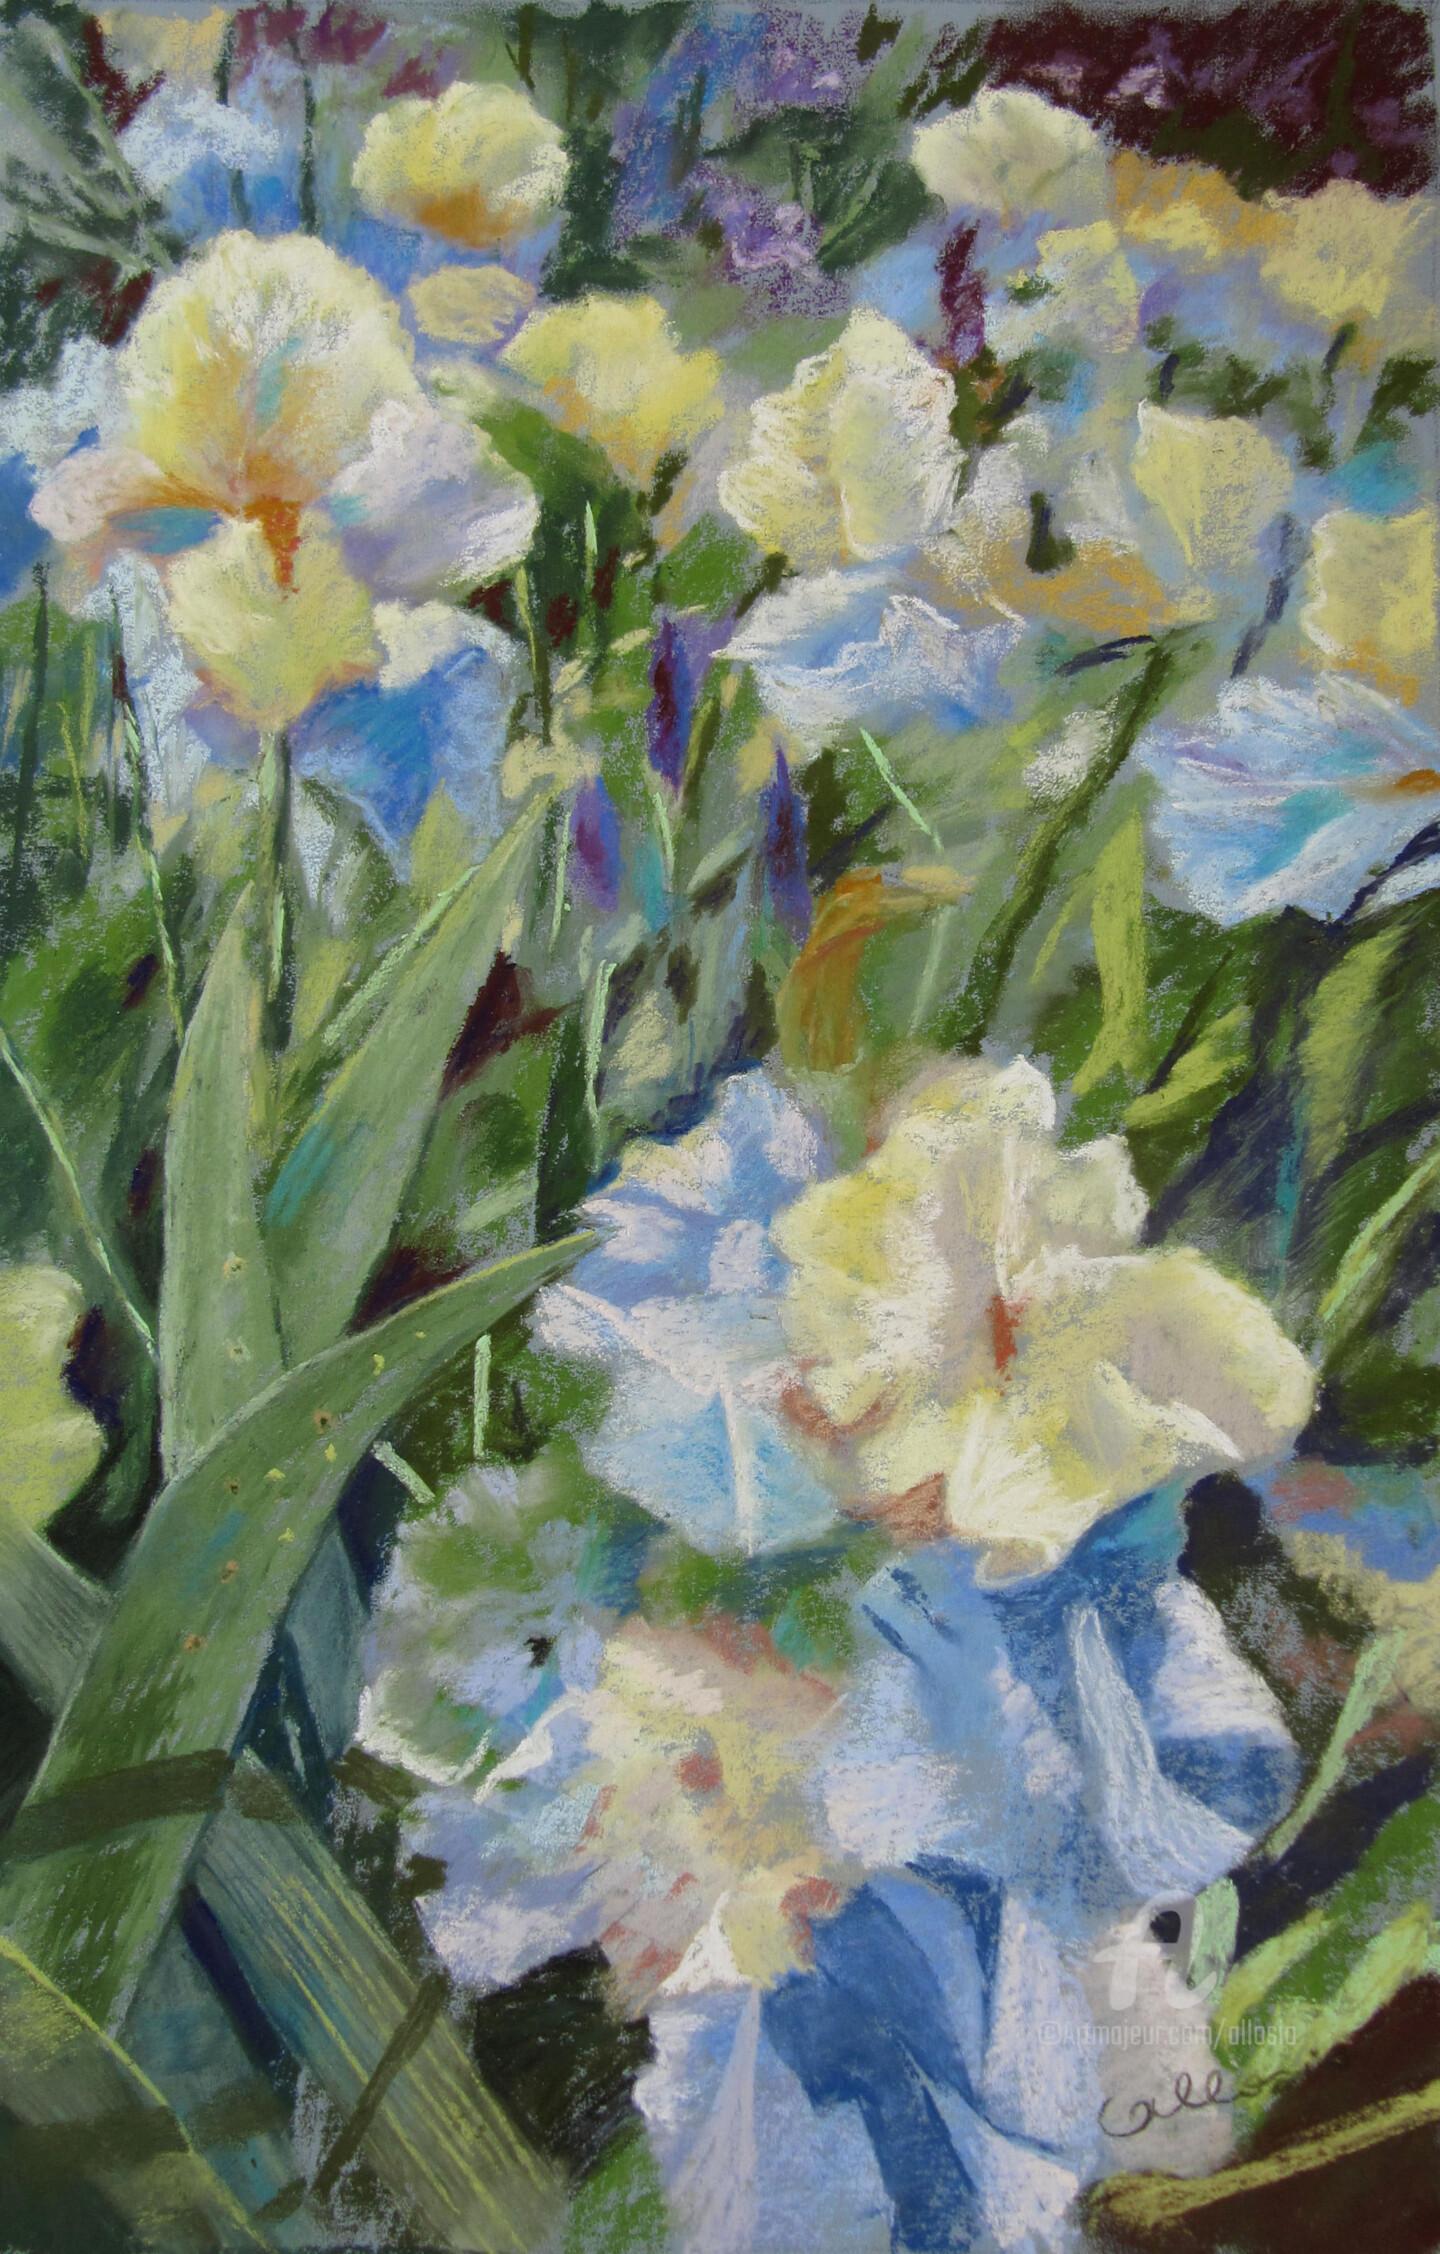 Claudette Allosio - Au milieu des iris